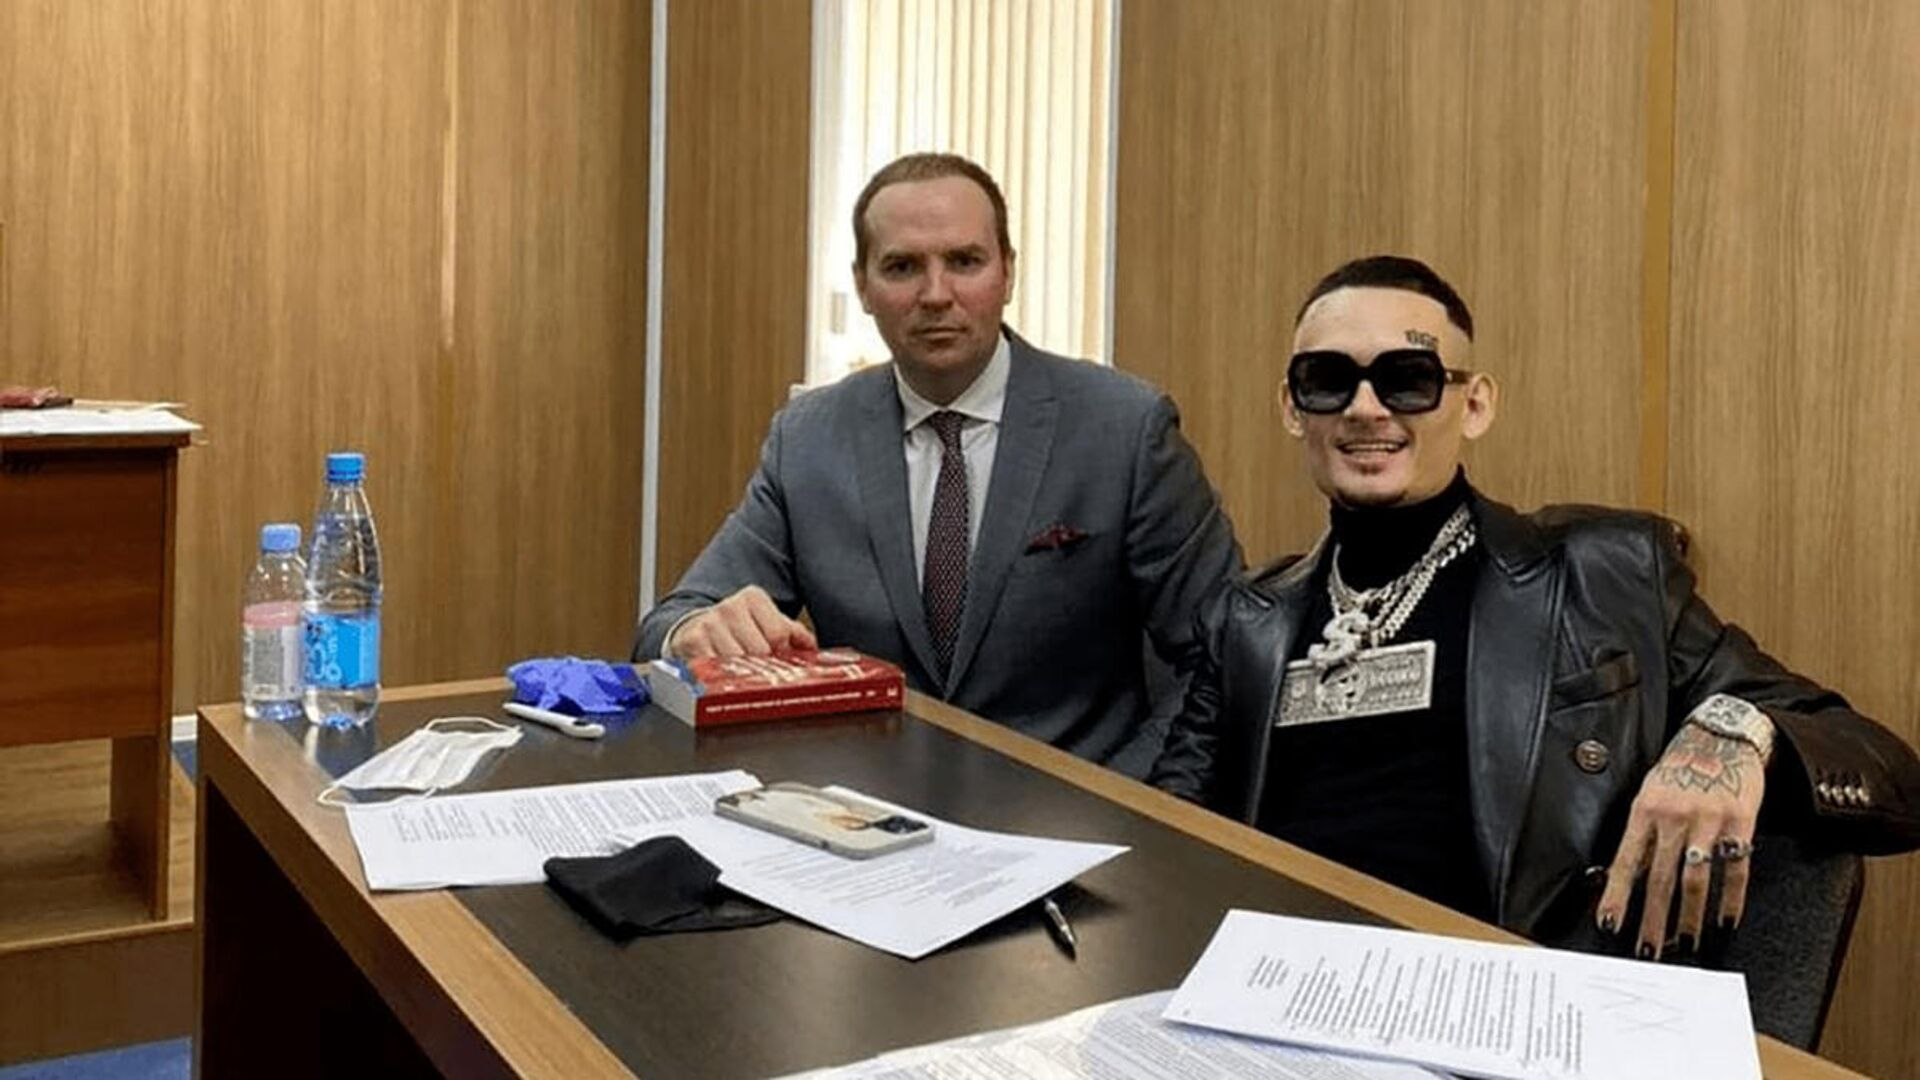 Моргенштерна оштрафовали на сто тысяч рублей